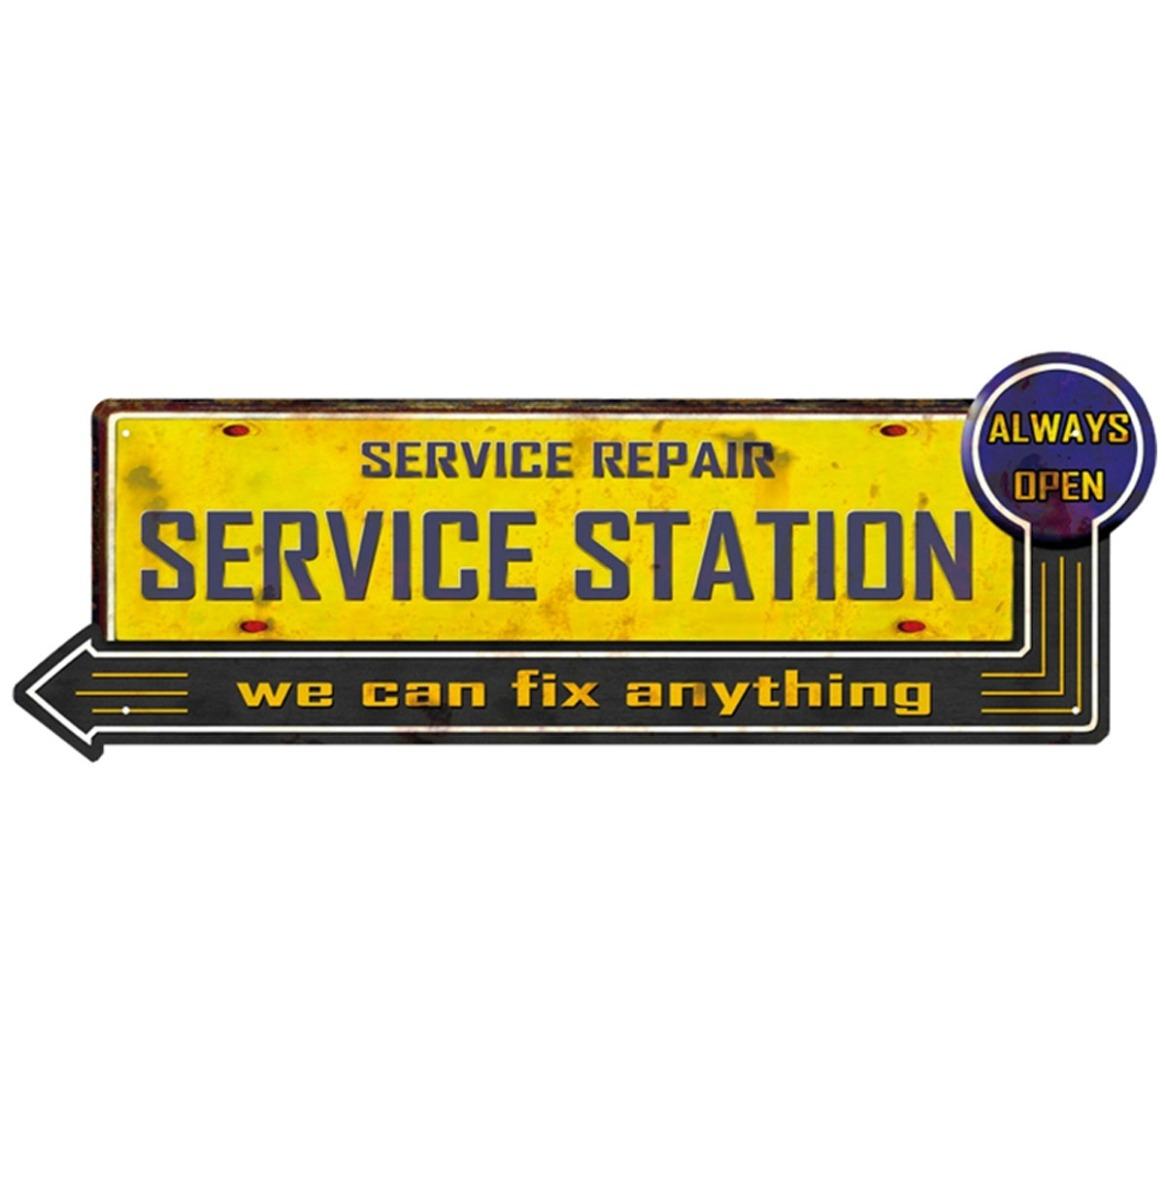 Service Repair Service Station Metalen Bord - 50 x 18 cm